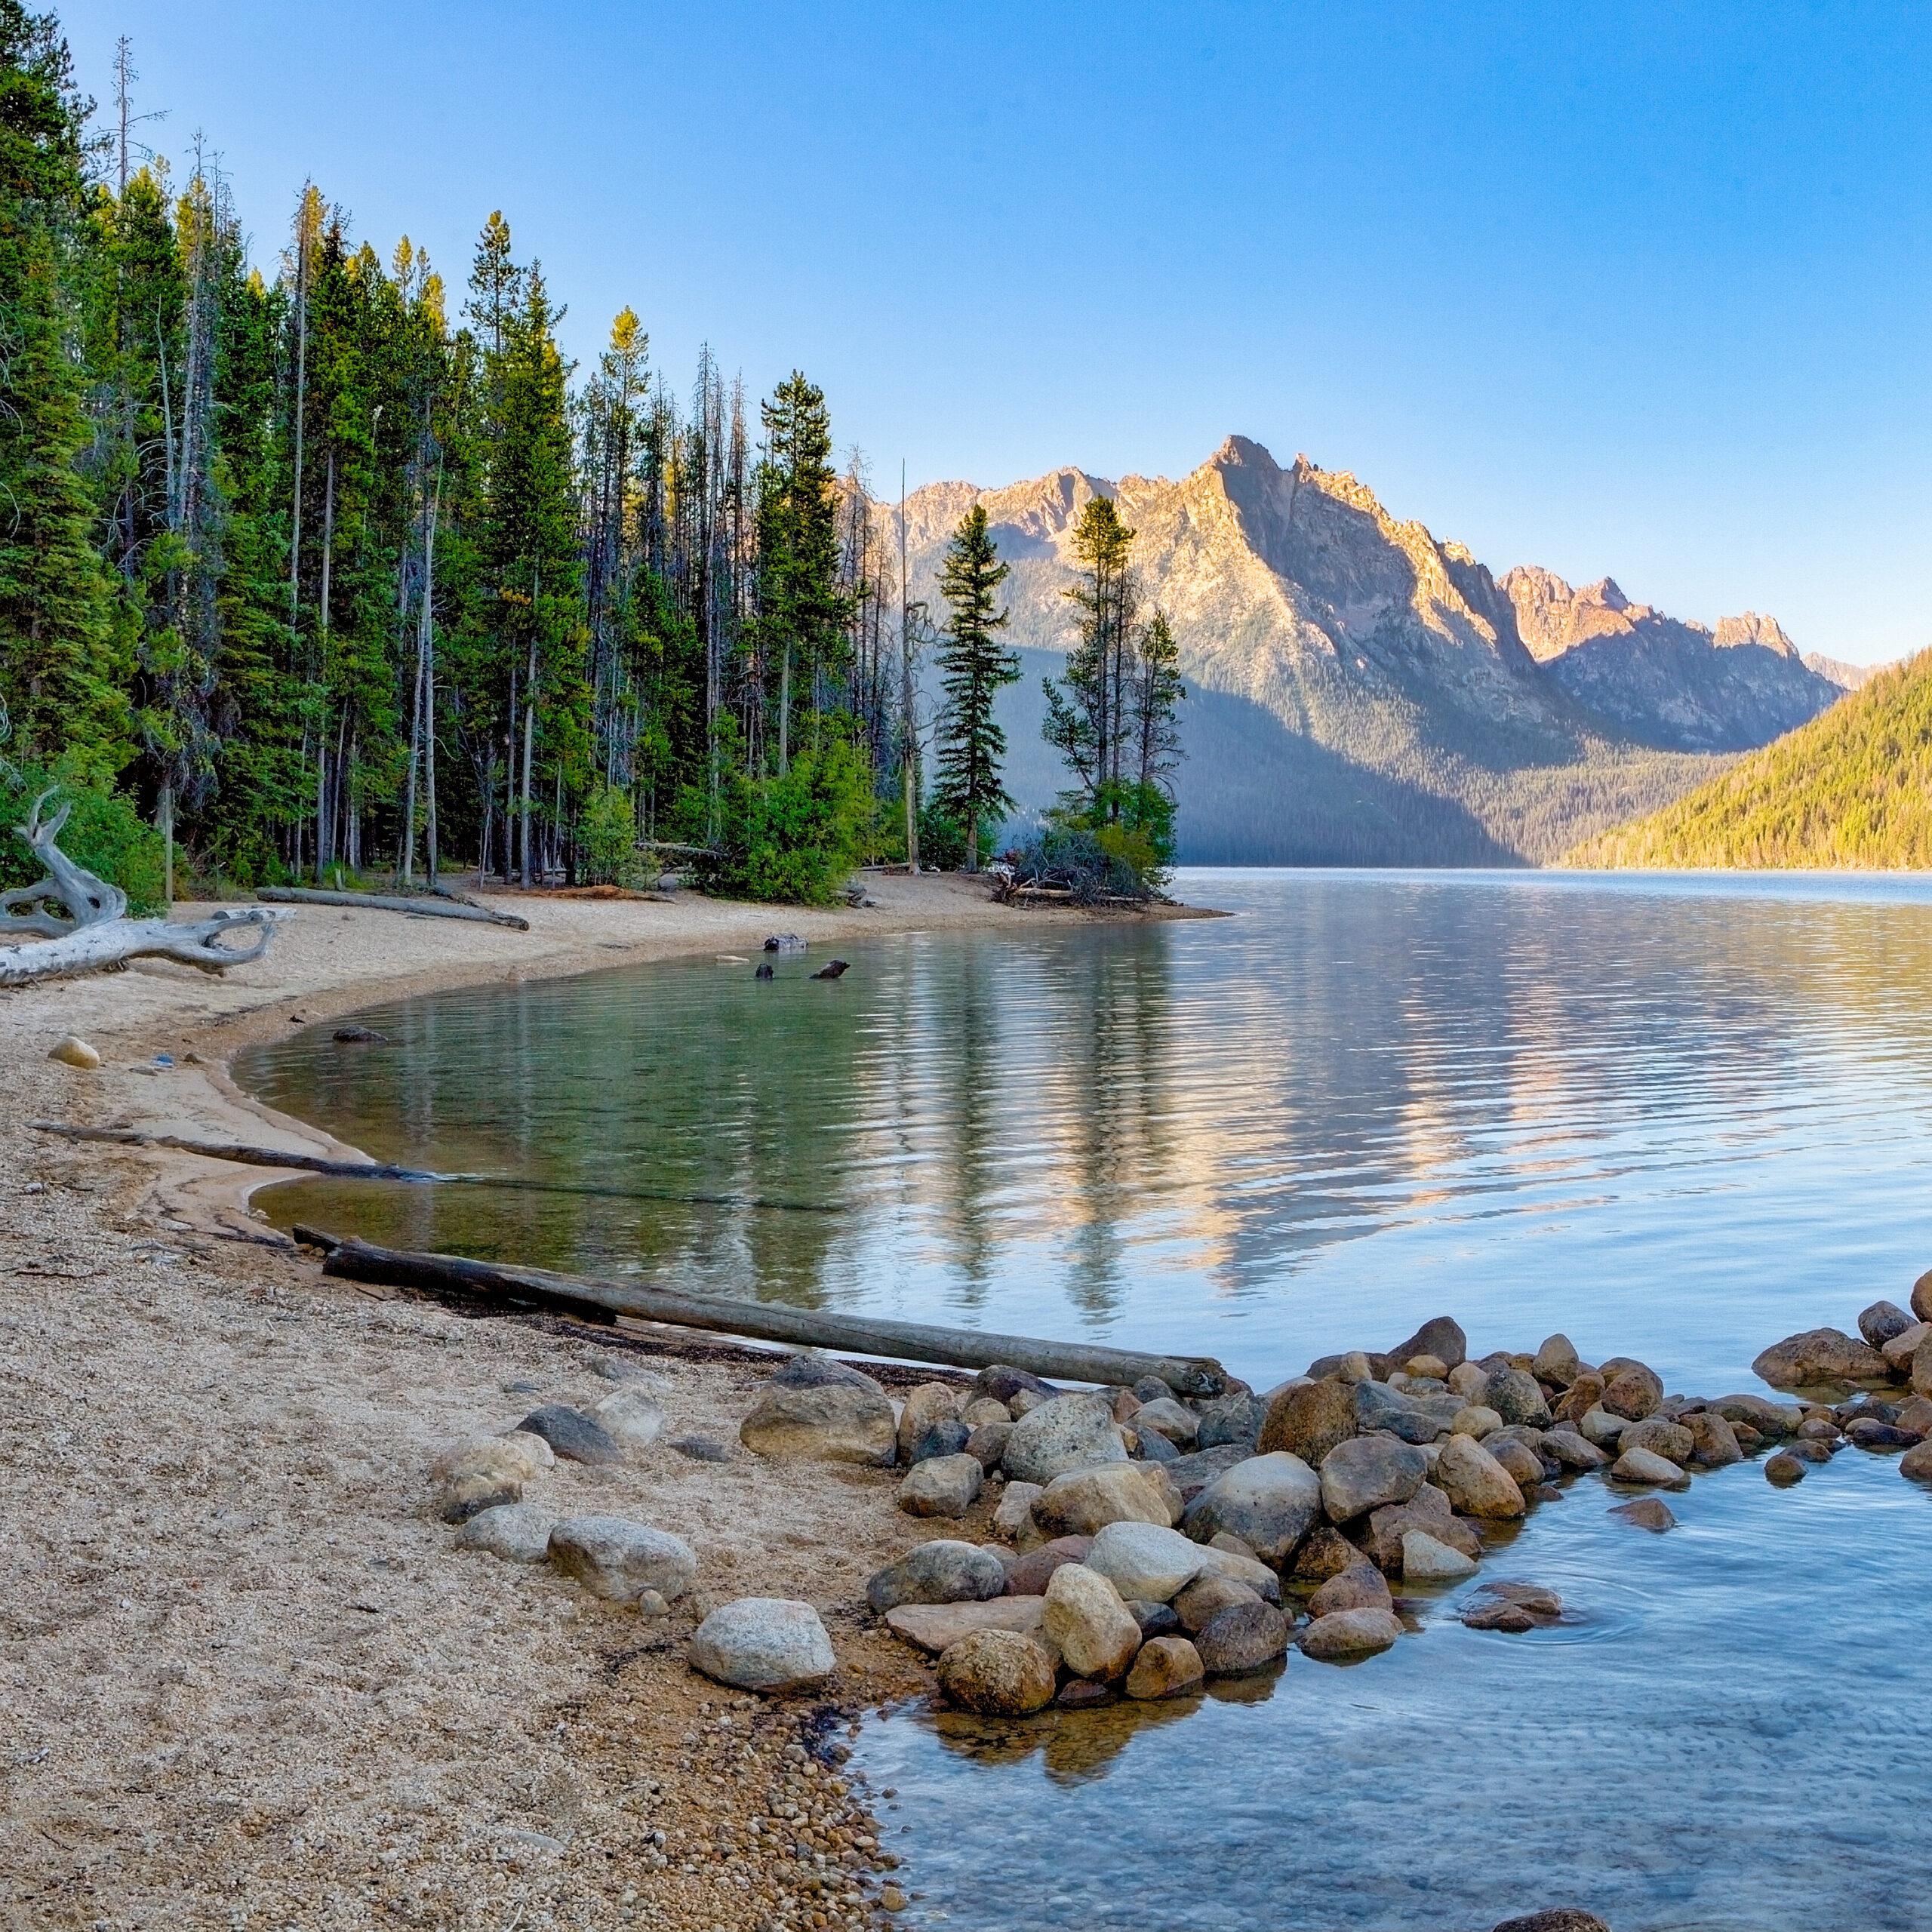 8 Reasons To Visit Idaho's Redfish Lake - TravelAwaits